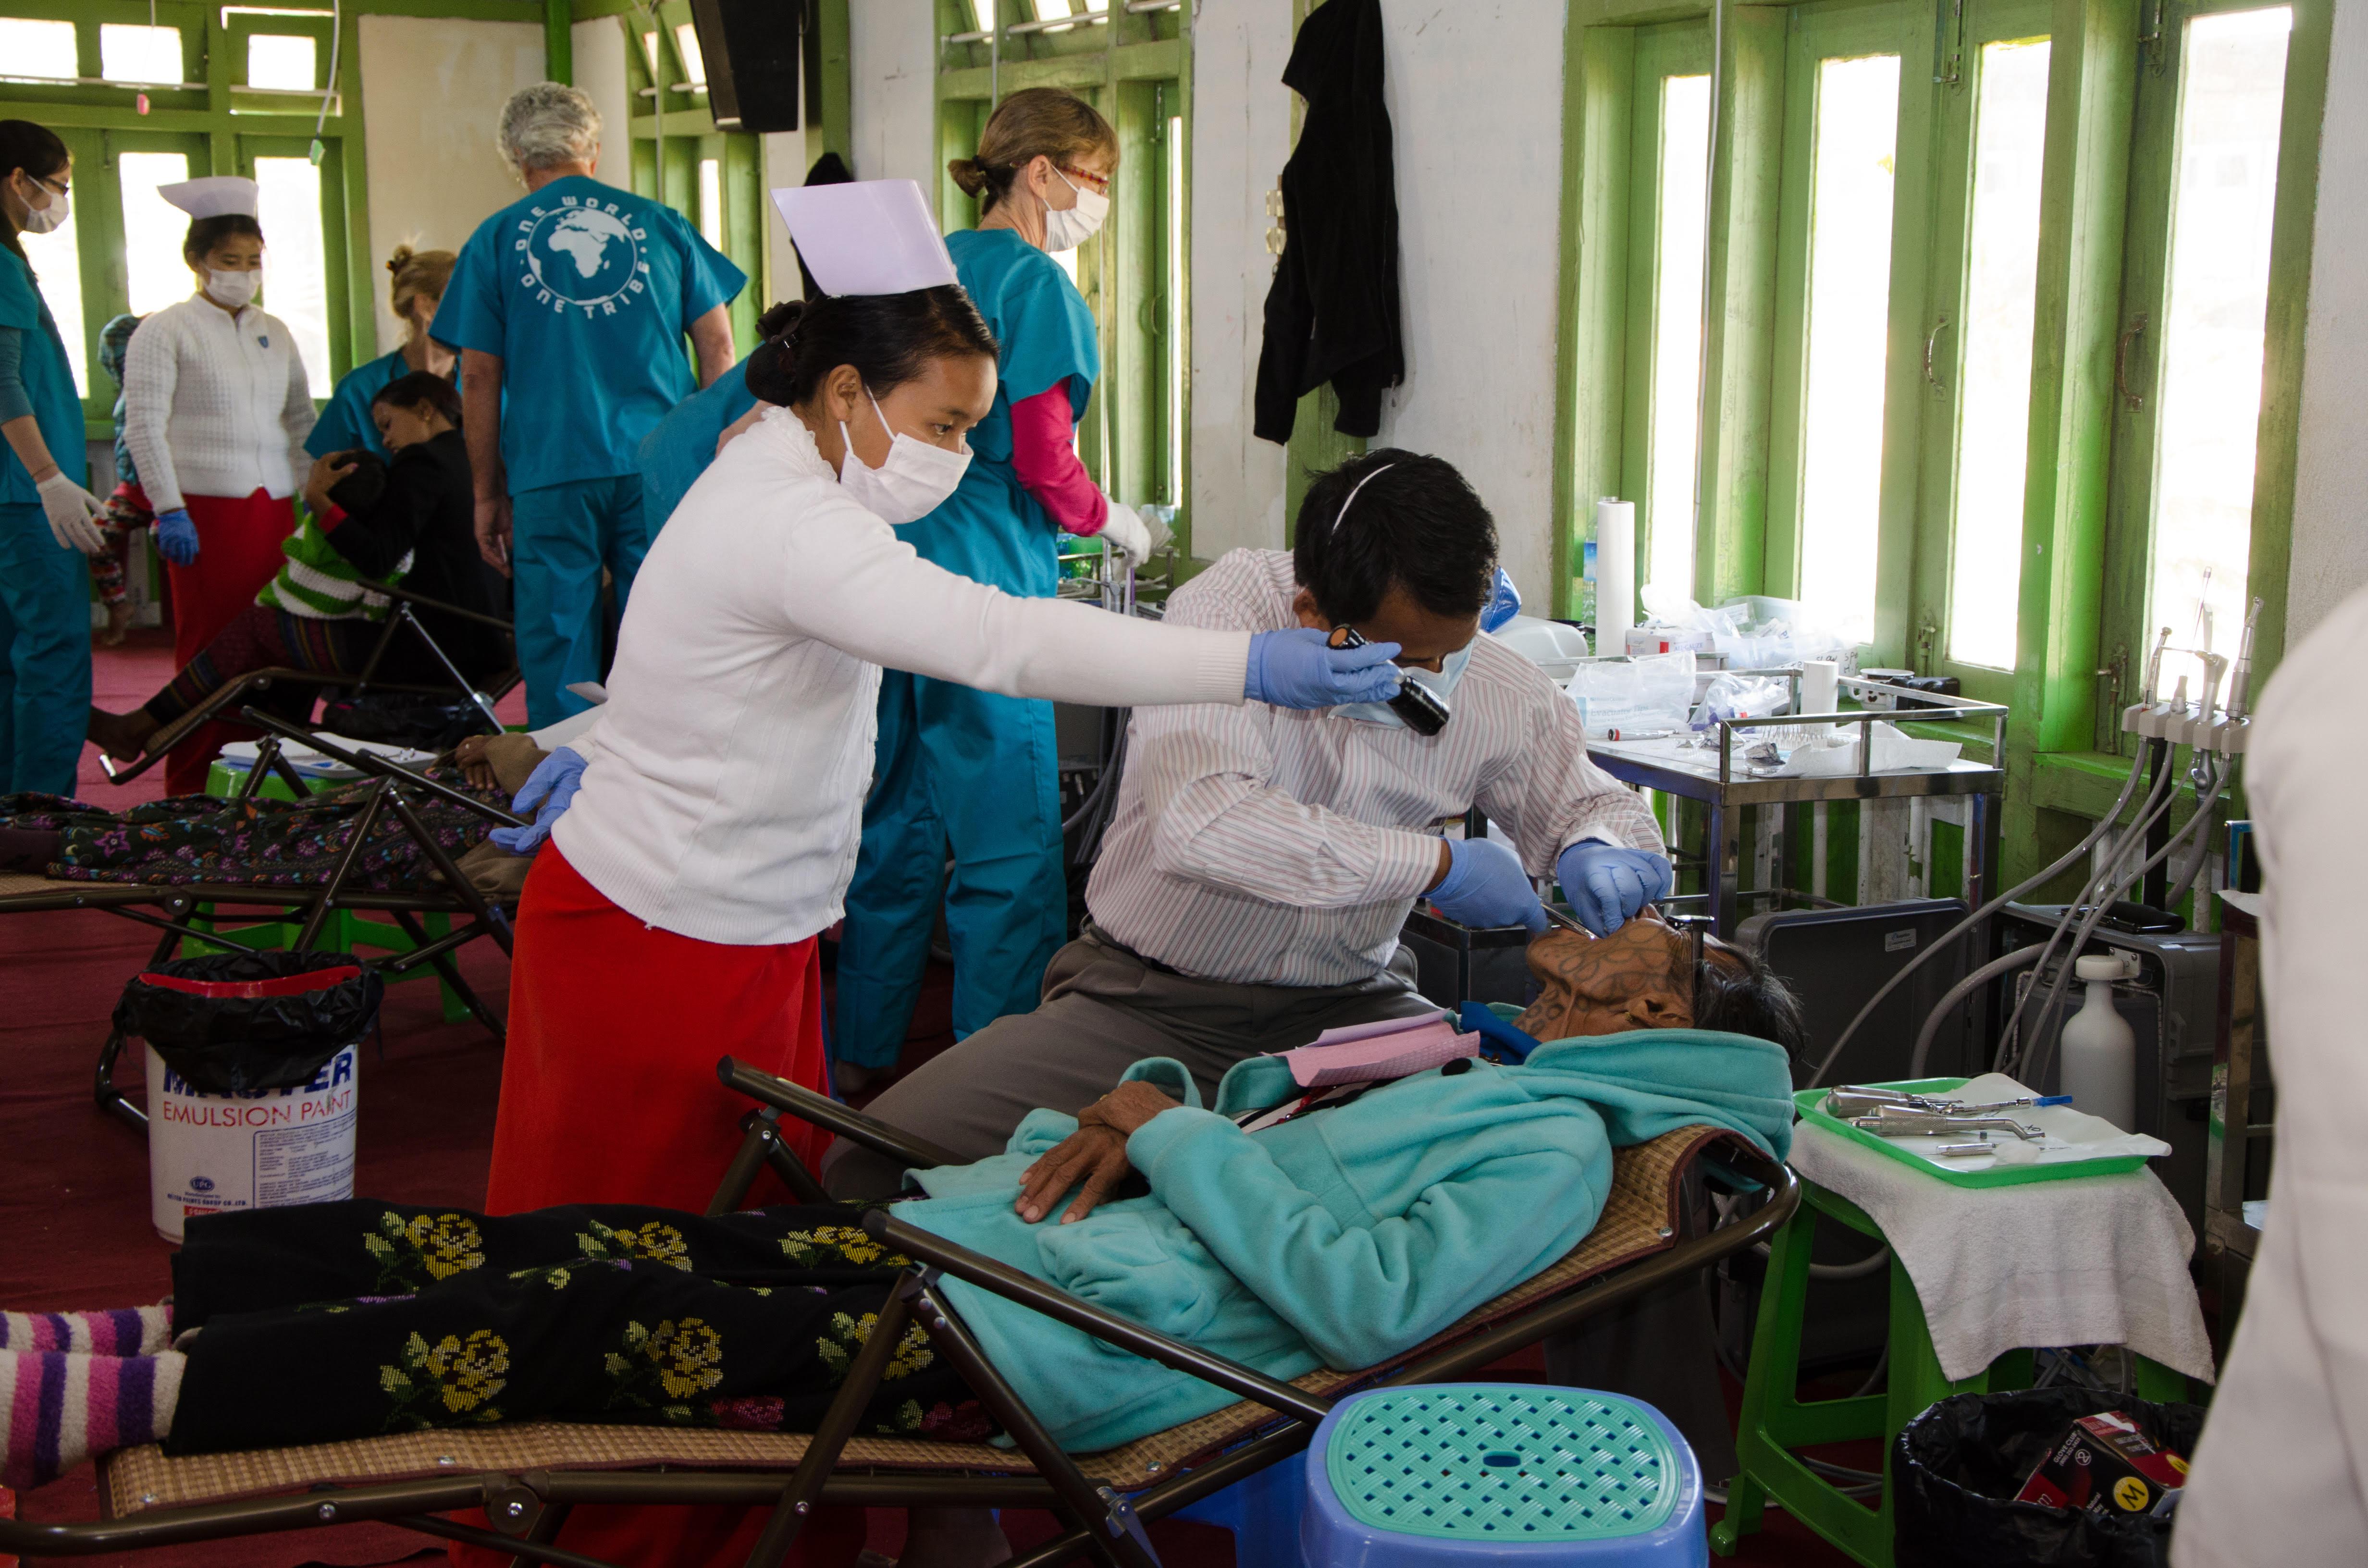 Help of local nurses and dentist